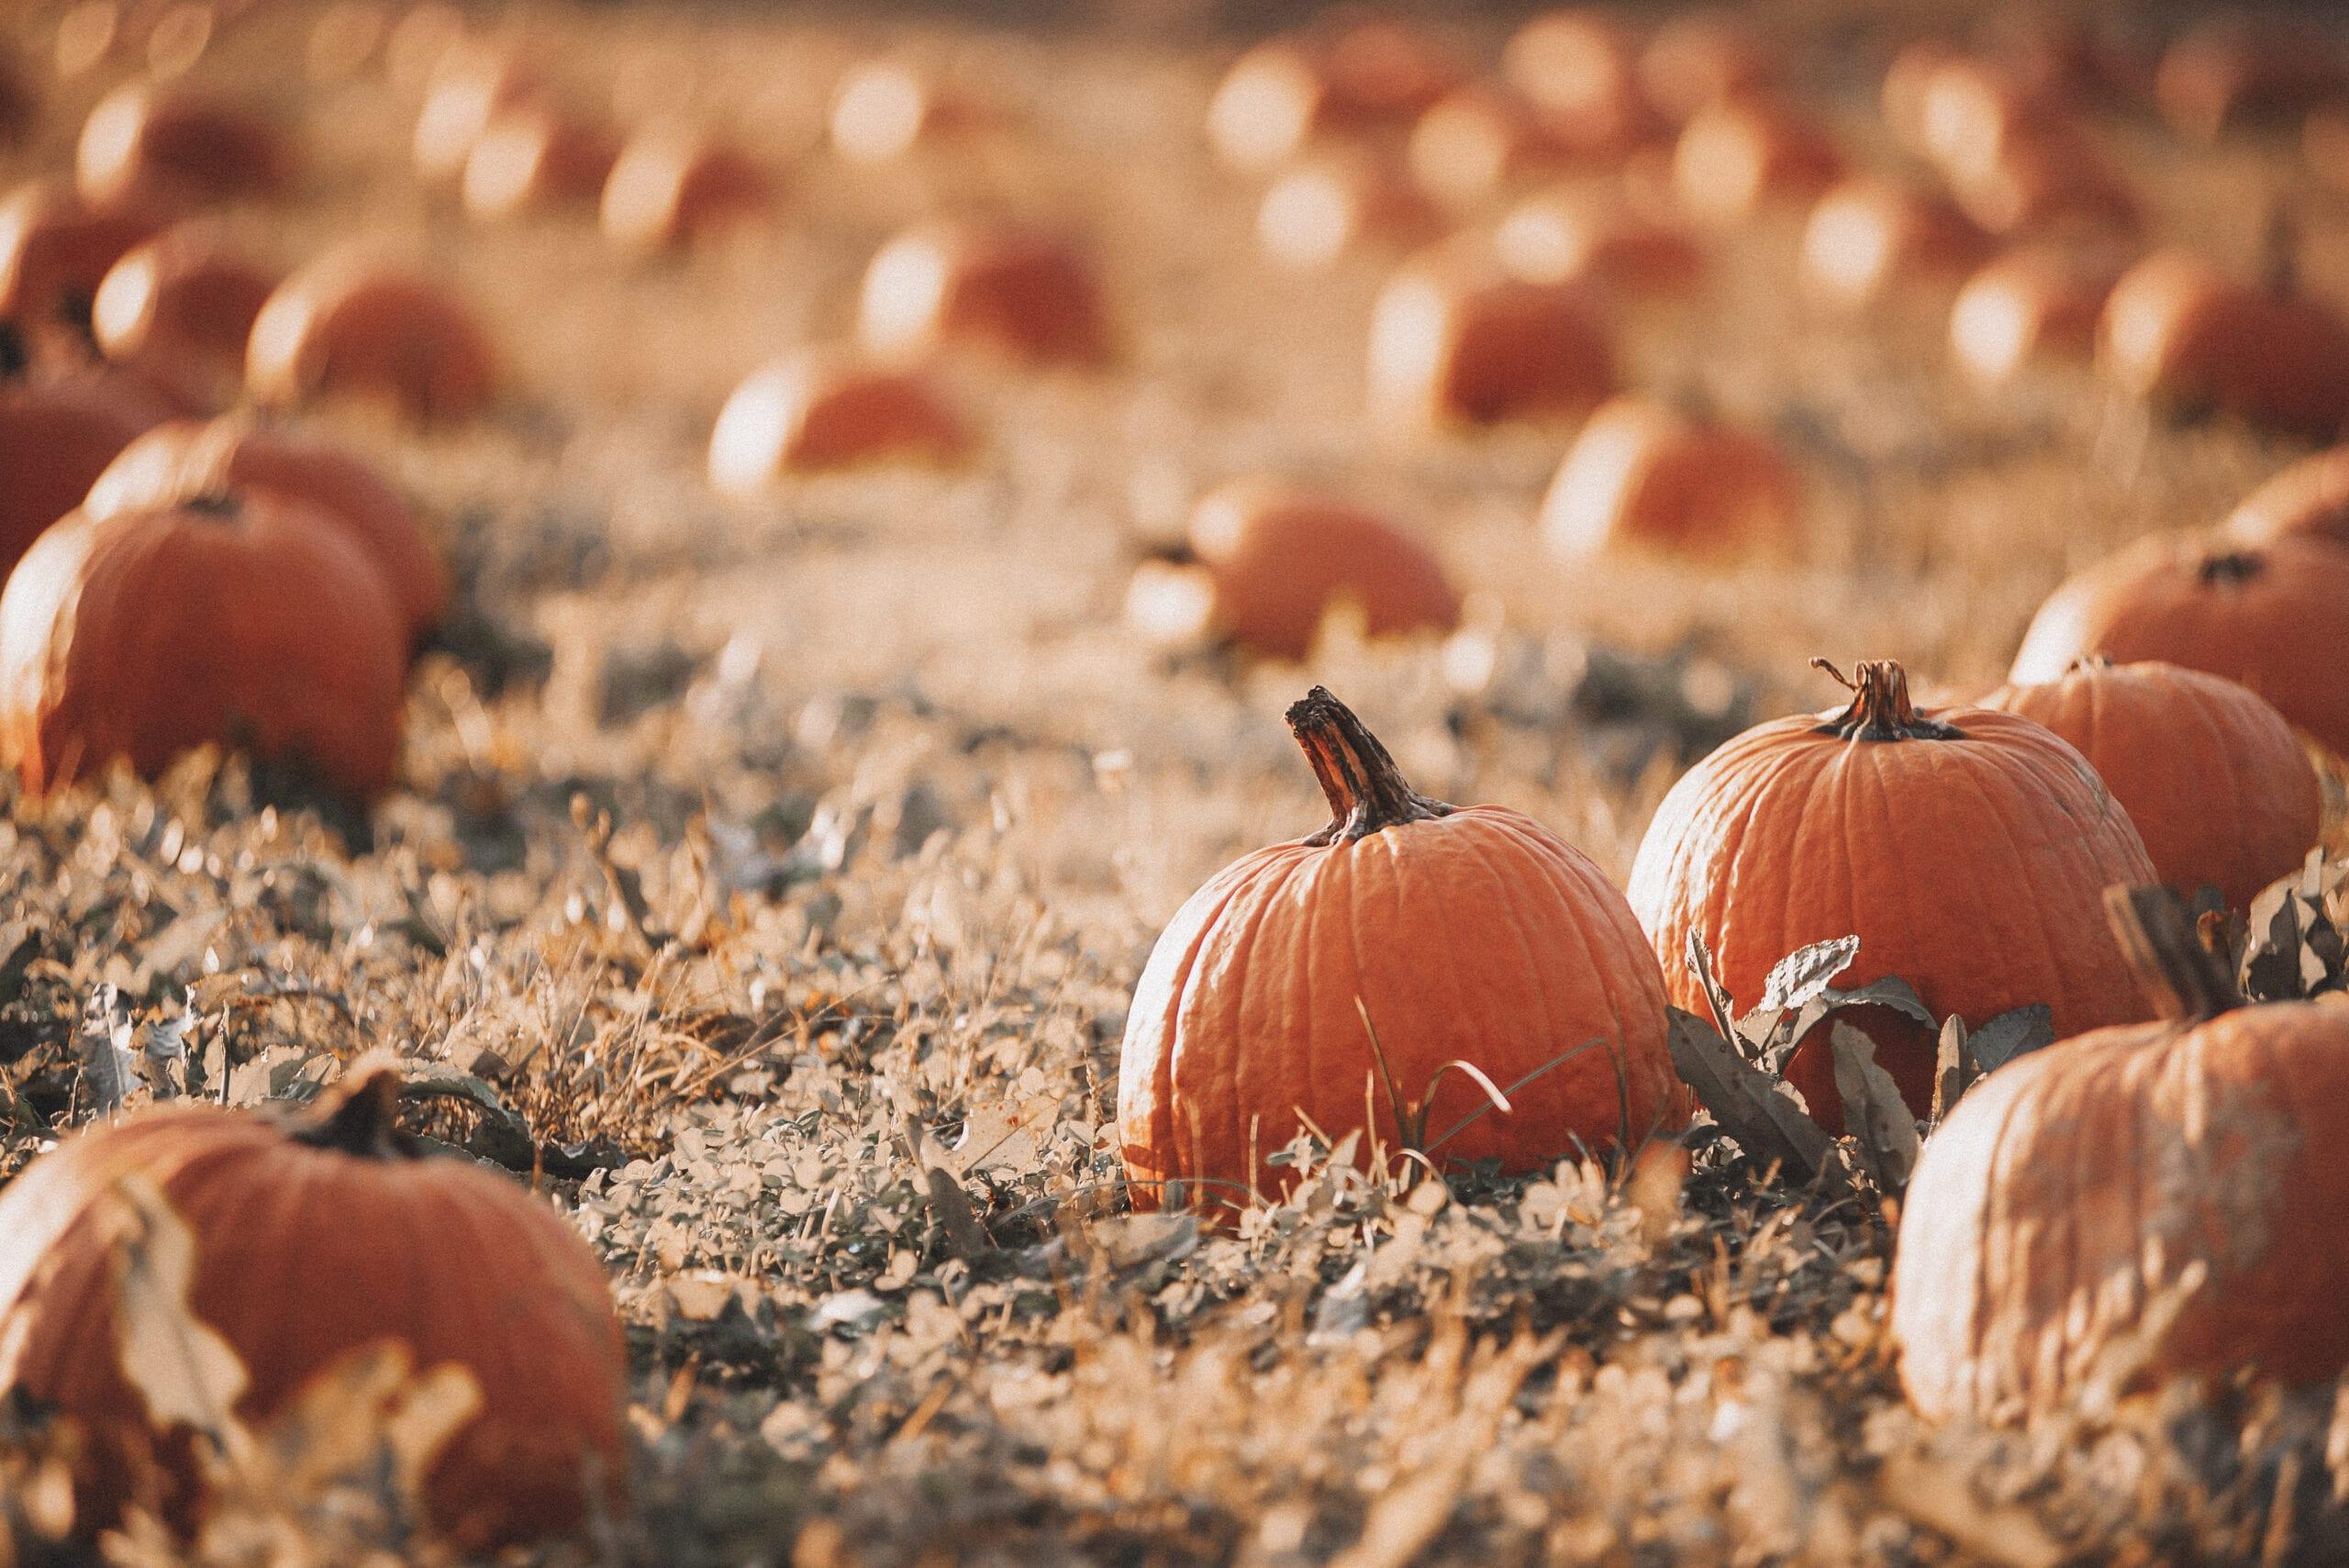 farm,A field of pumpkins growing.